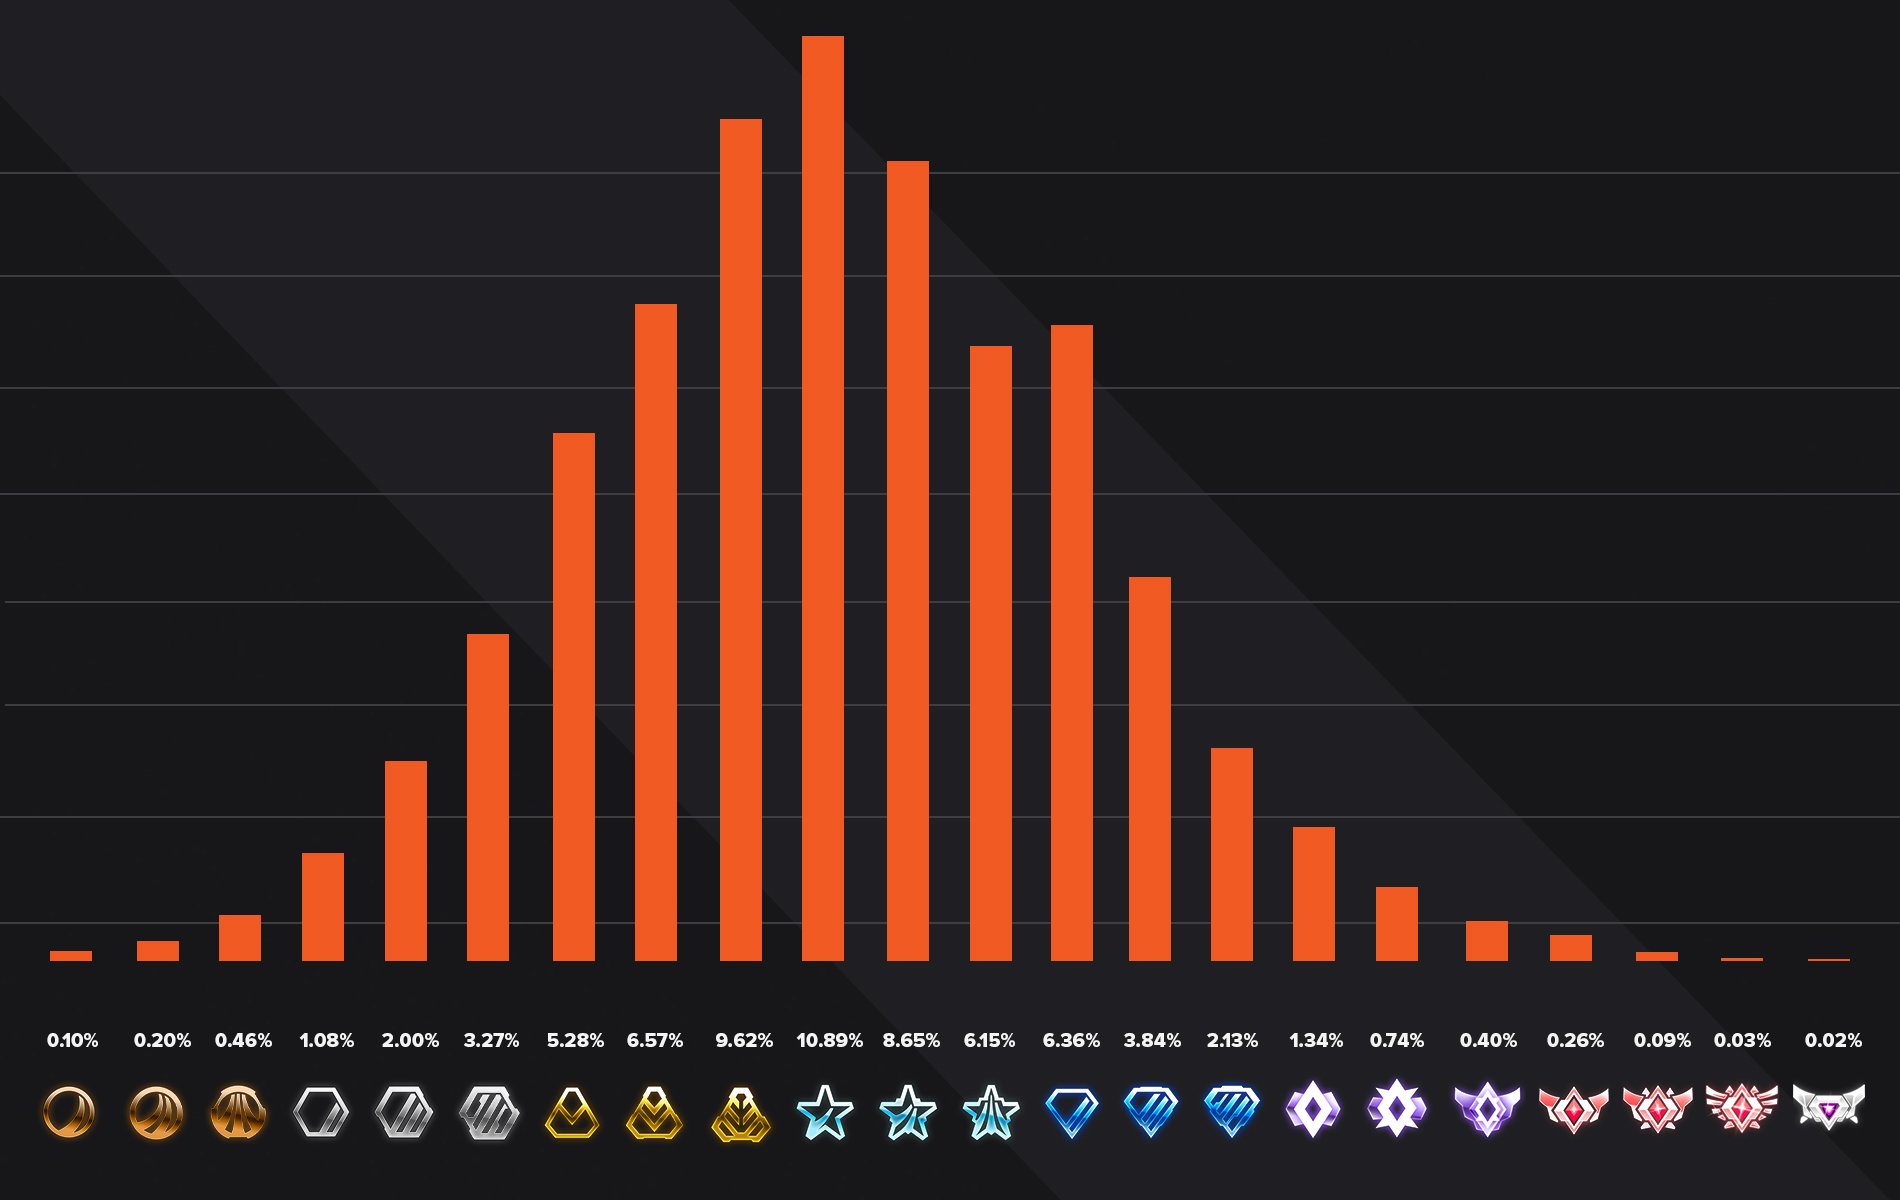 3V3 rocket league ranks distribution